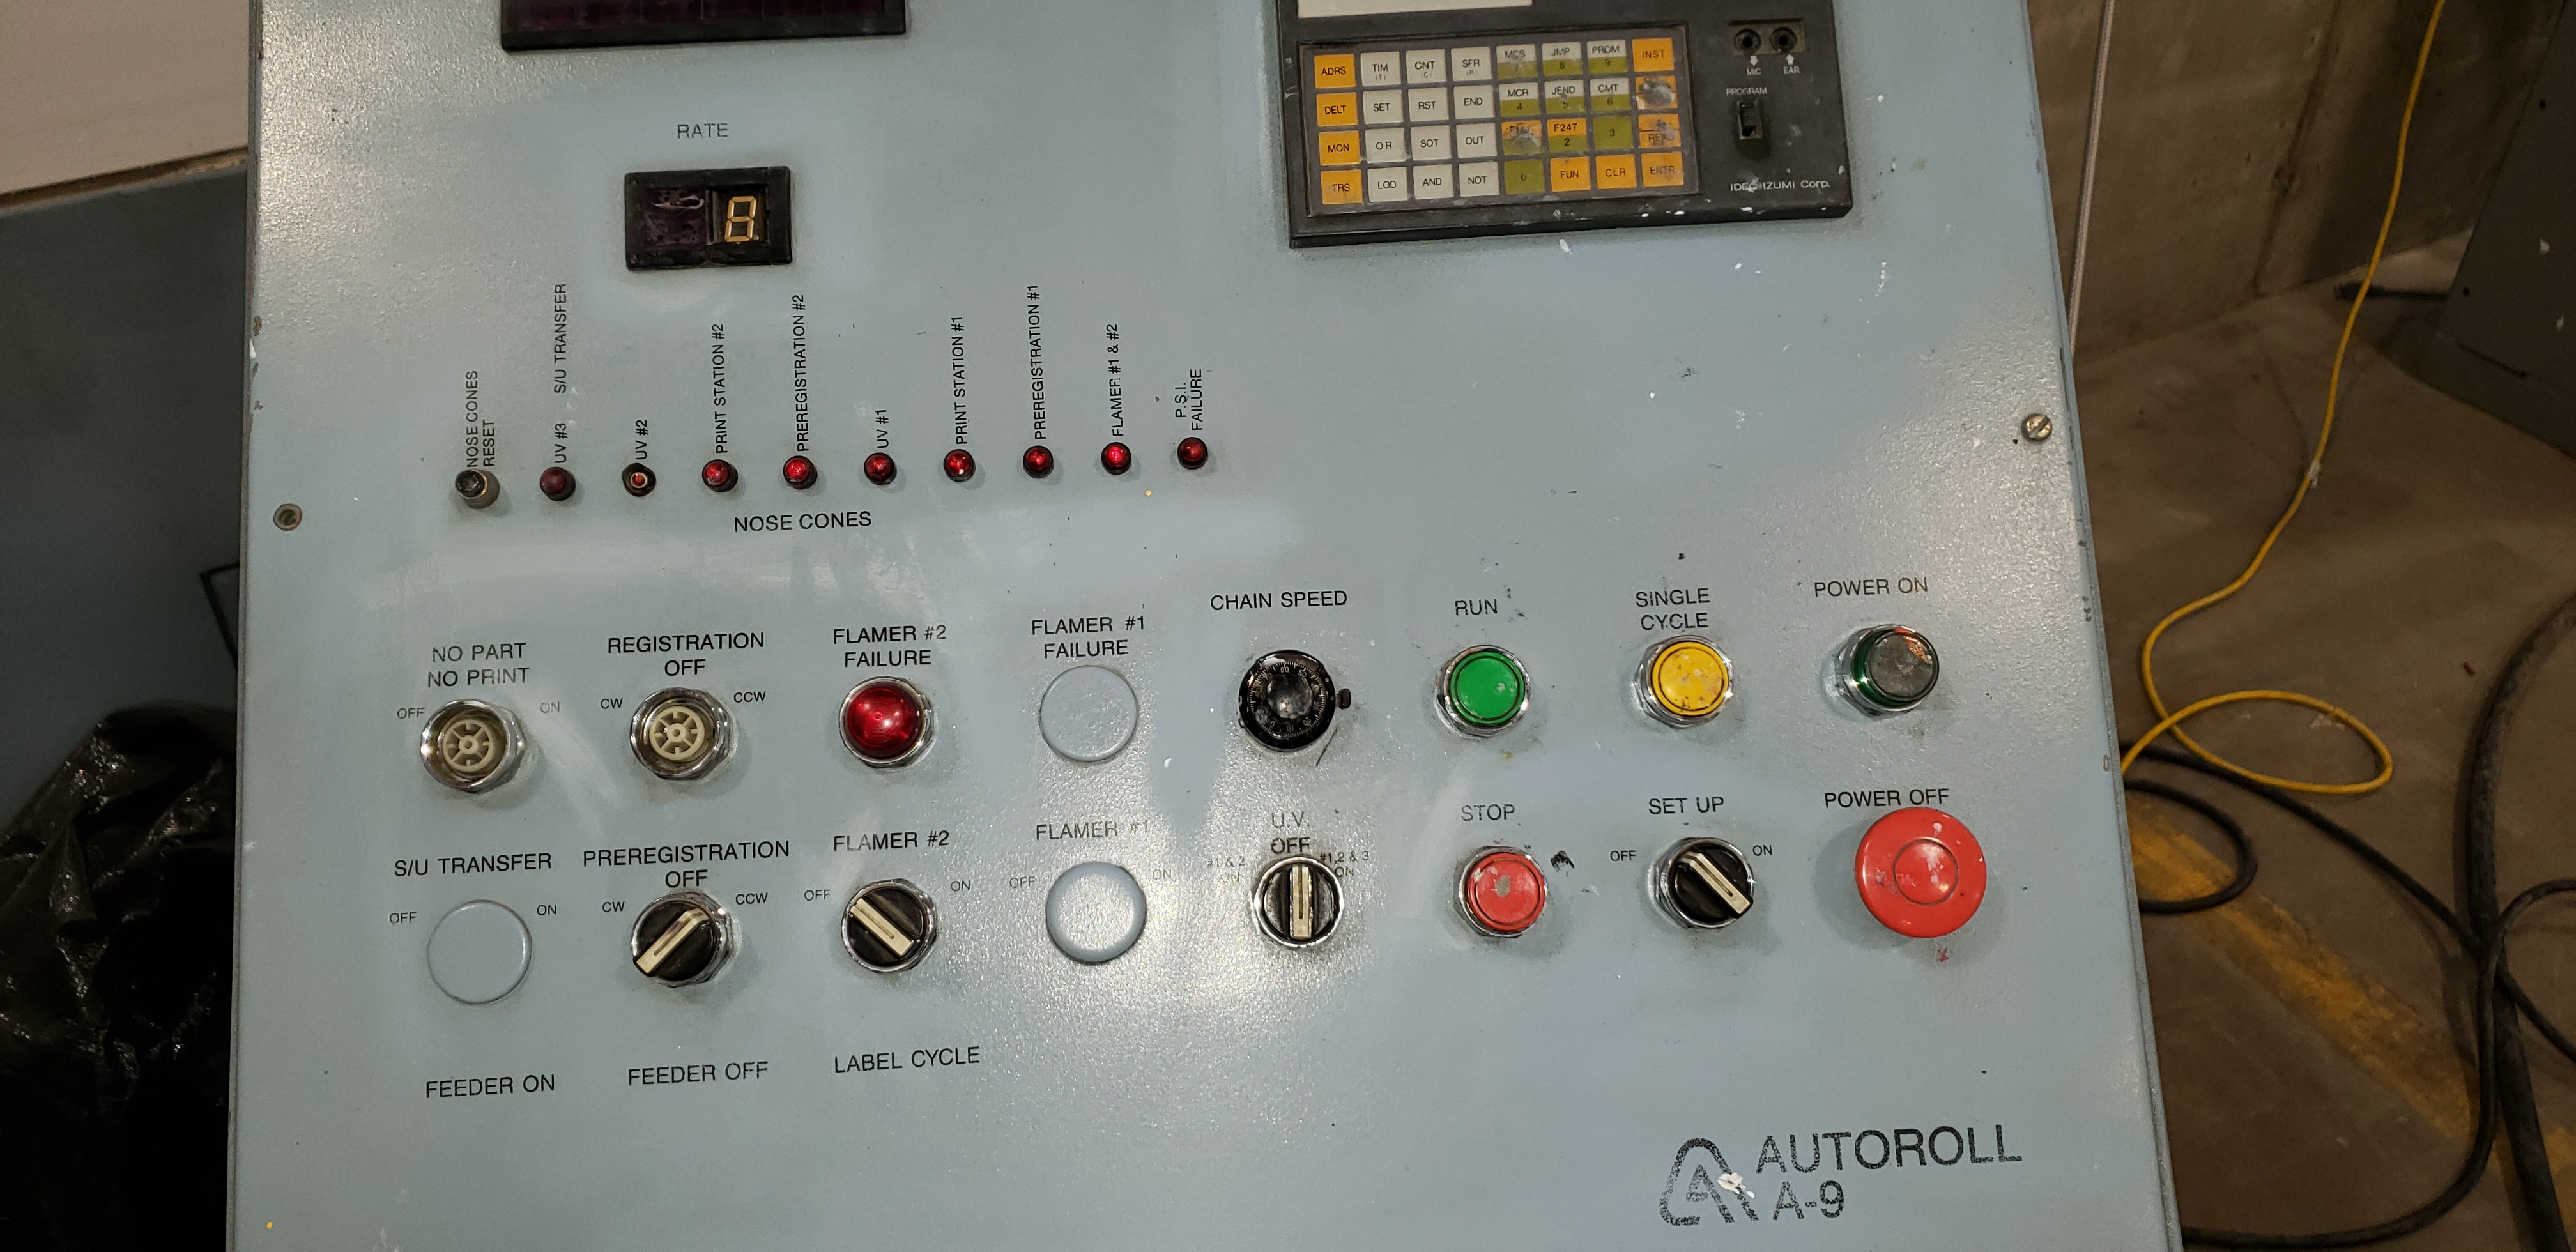 AutoRoll Model A9 /1- Color, Automatic, UV, Bottle Printer - Image 18 of 25